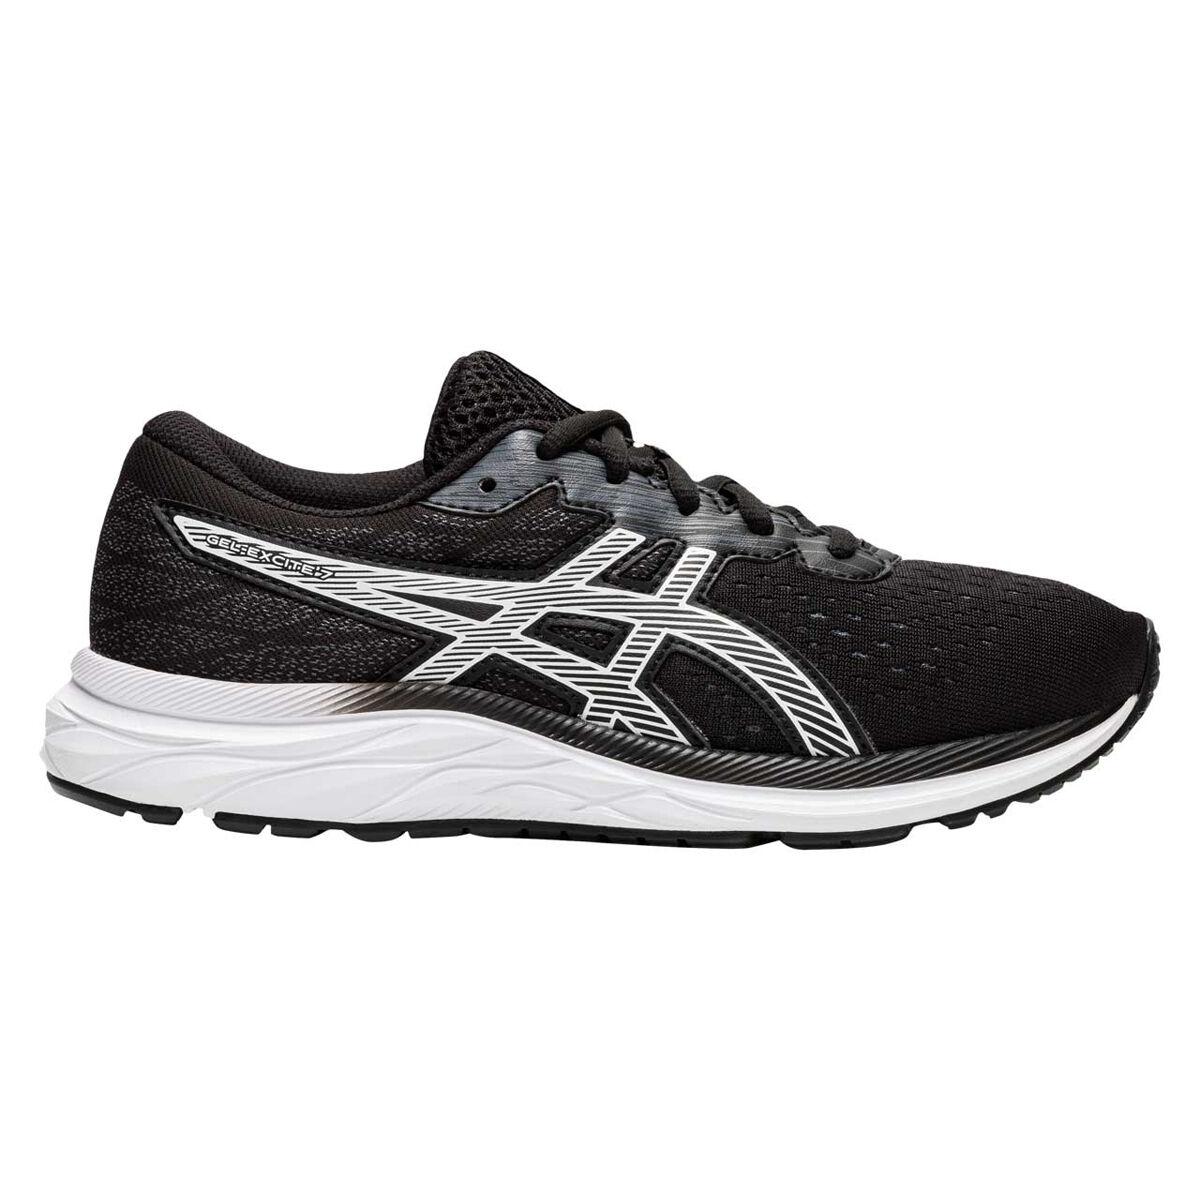 adidas ff80 blackout shoes black women pants   Asics GEL Excite 7 Kids Running Shoes